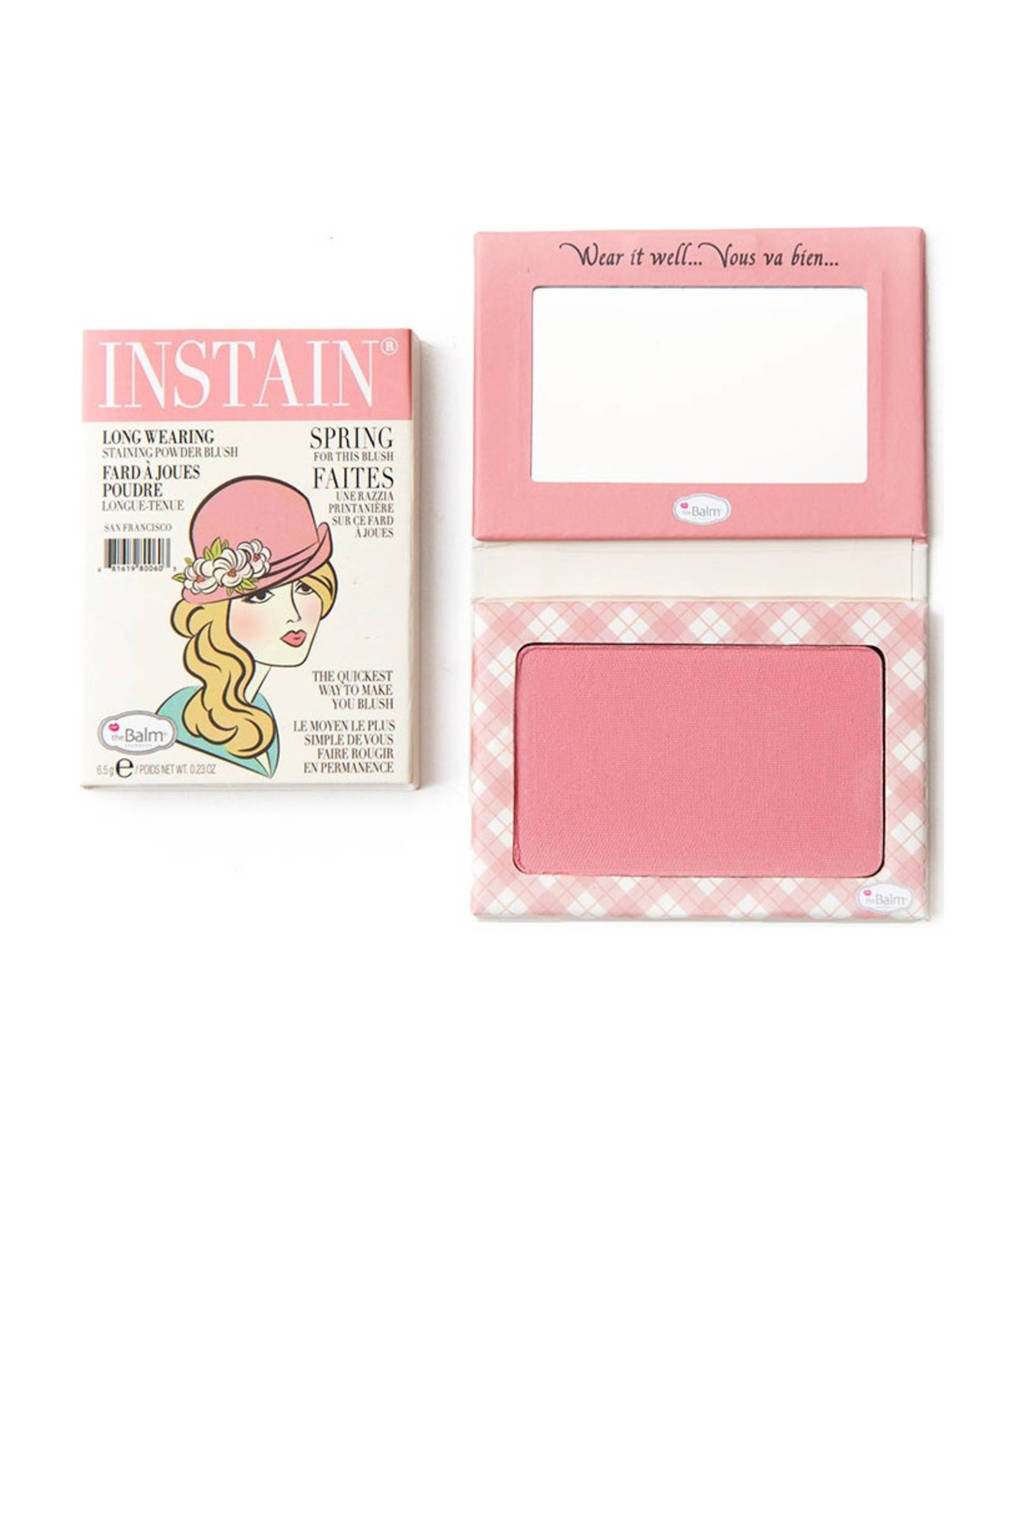 The Balm InStain blush - Argyle, petal pink